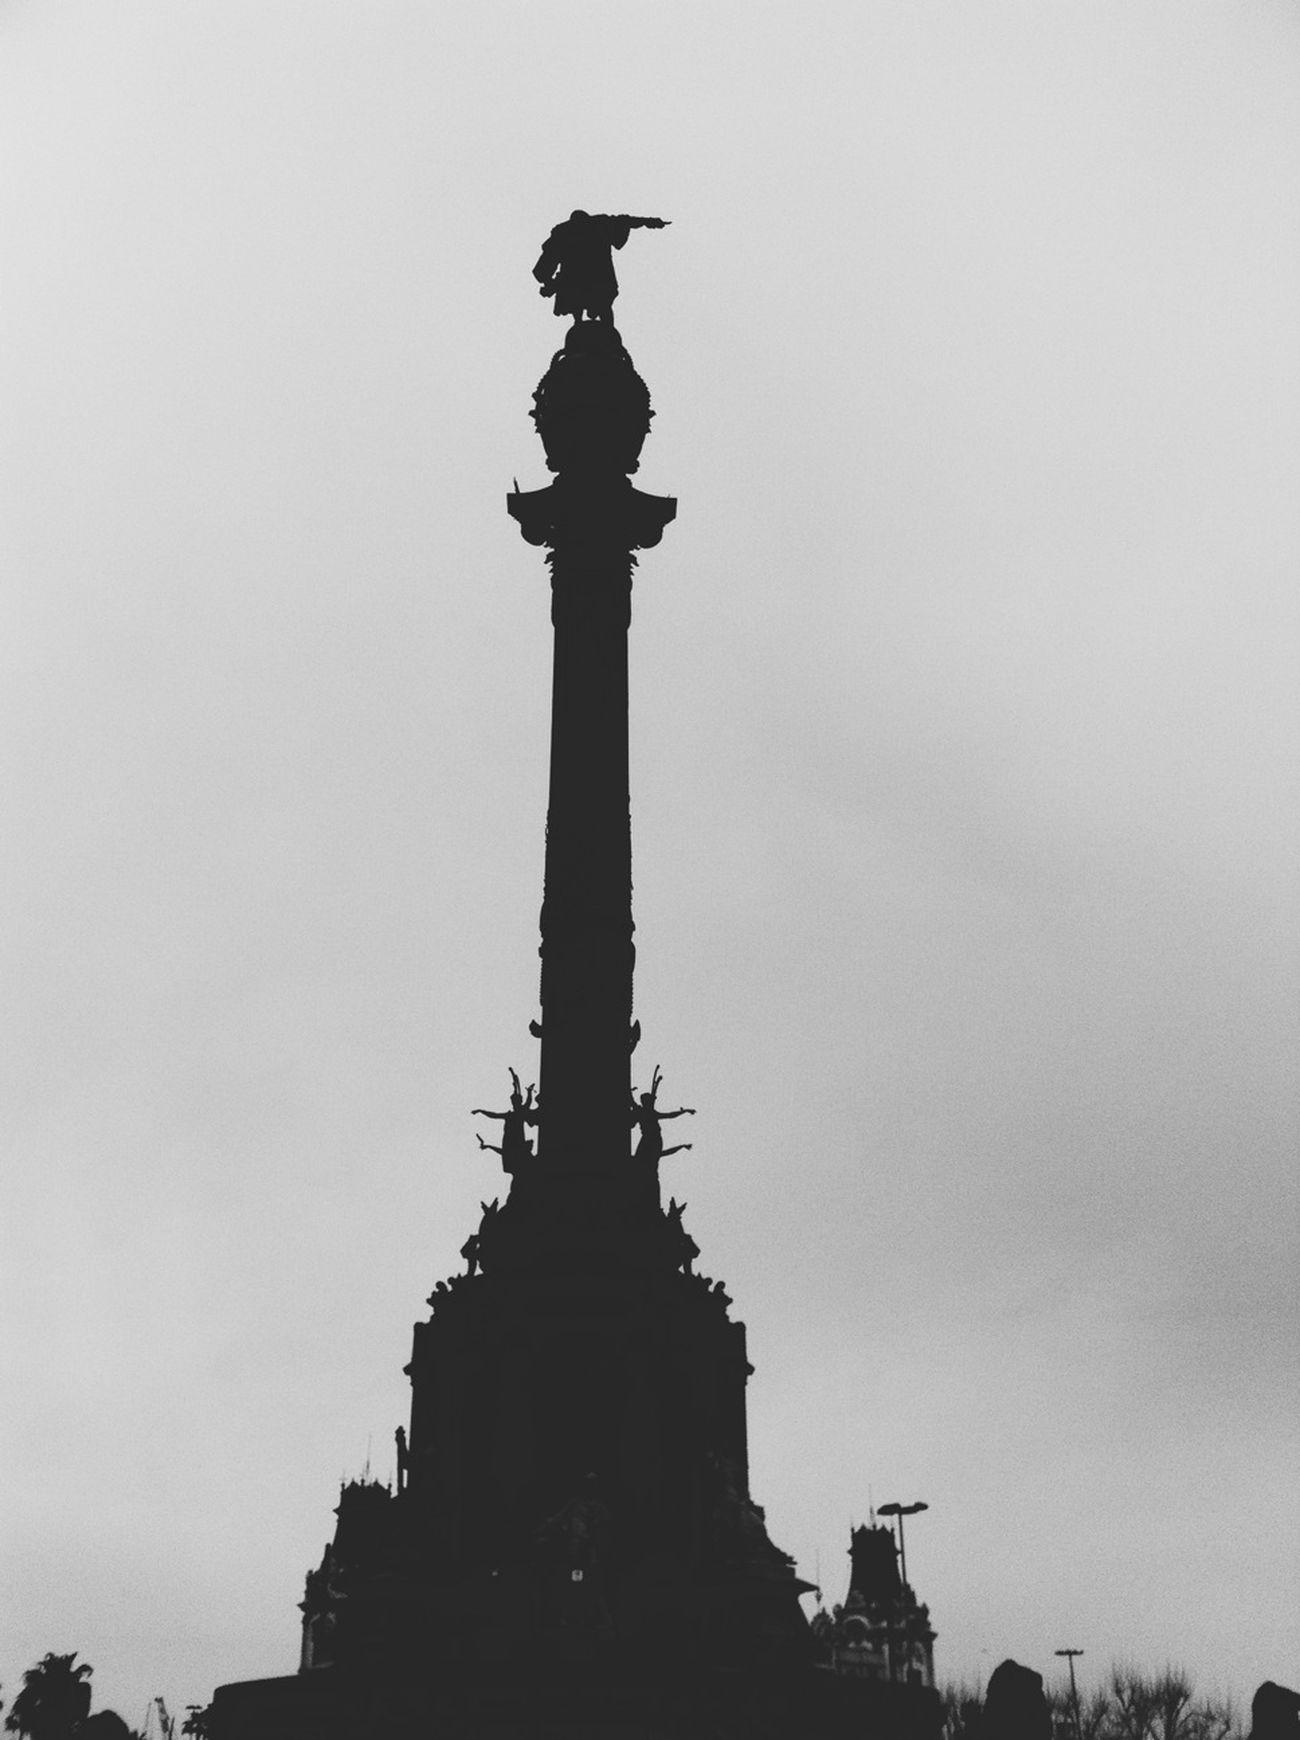 Streetphotography Taking Photos Barcelona Eye4photography